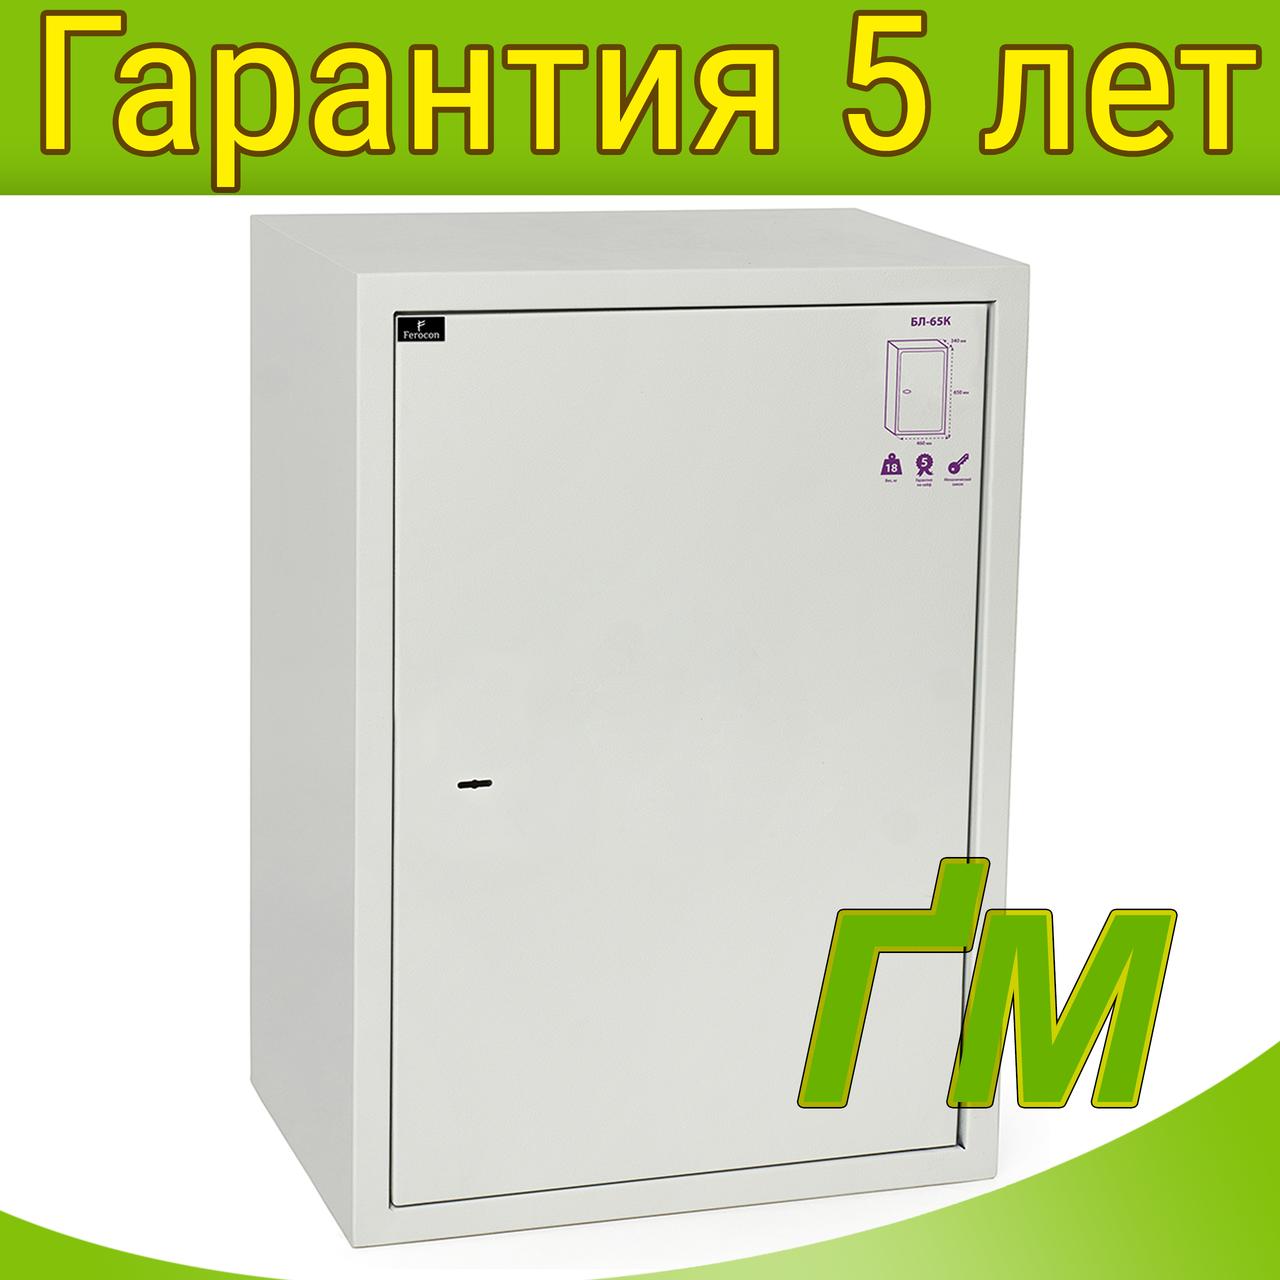 Шкаф-сейф БЛ-65К.Т1.П1.7035